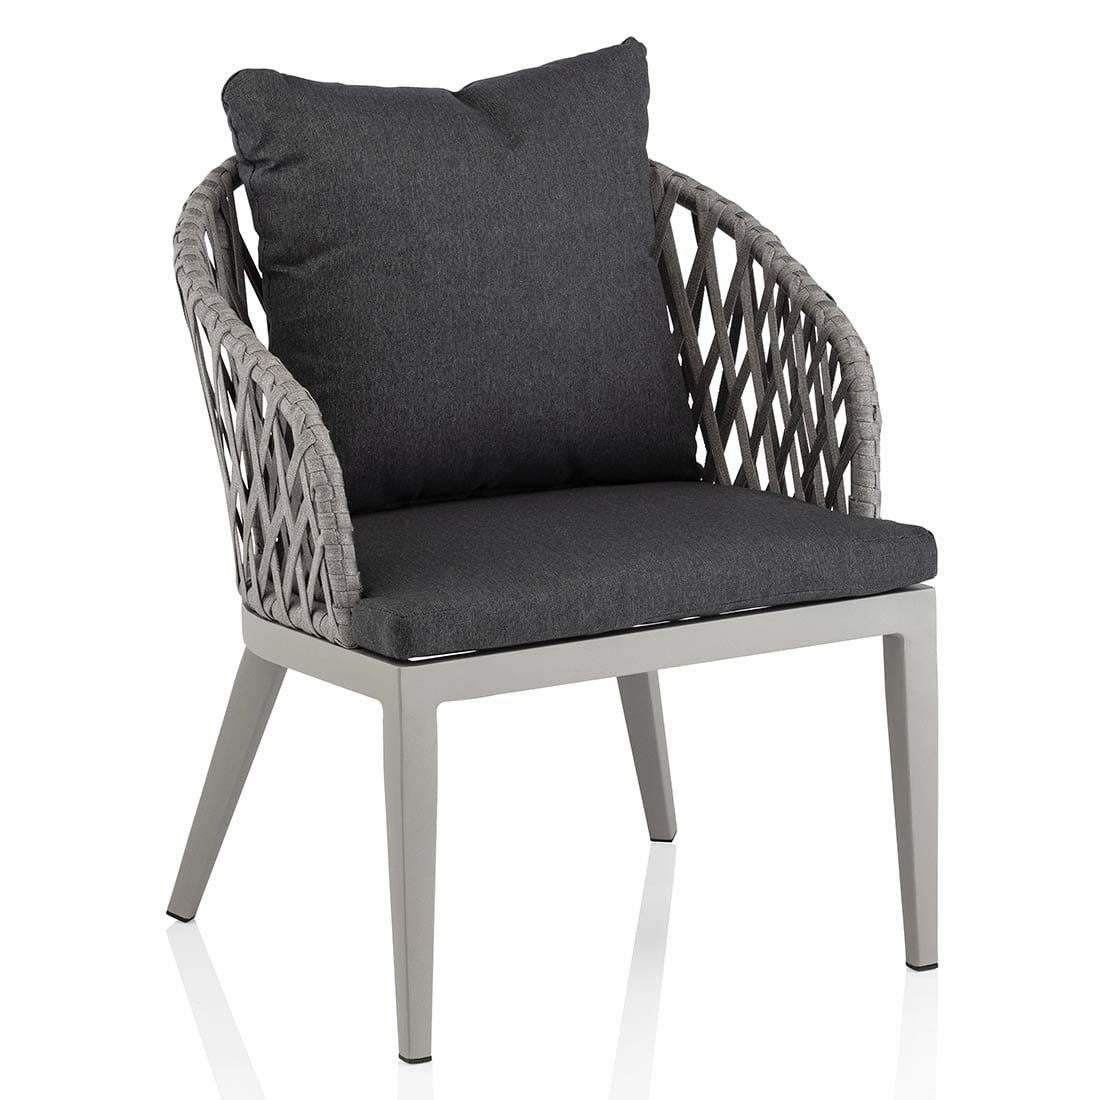 Kettler Sunny Diningsessel Aluminium Rope Anthrazit Grau Grau